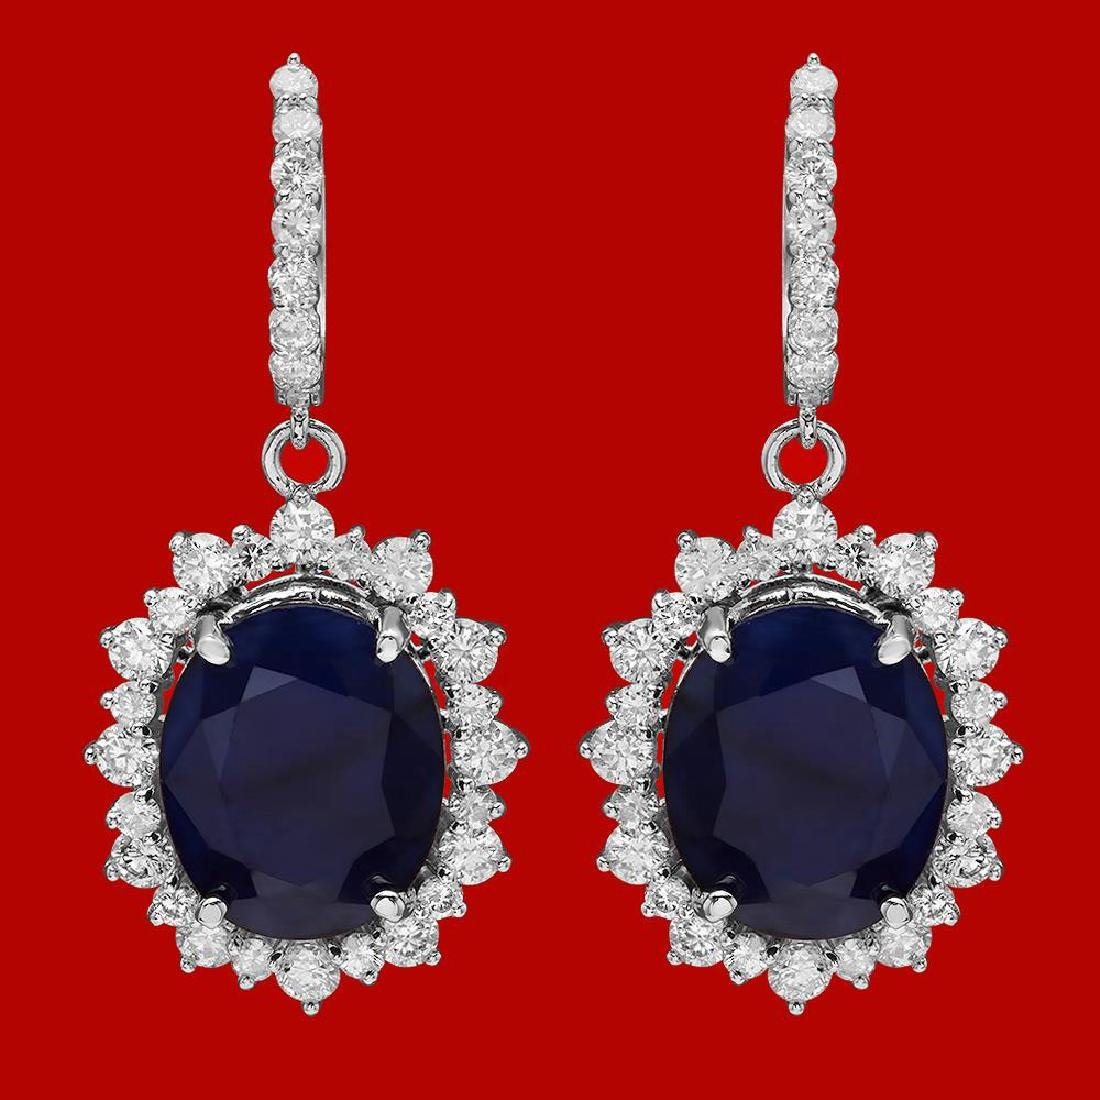 14k Gold 18.89ct Sapphire 3.12ct Diamond Earrings